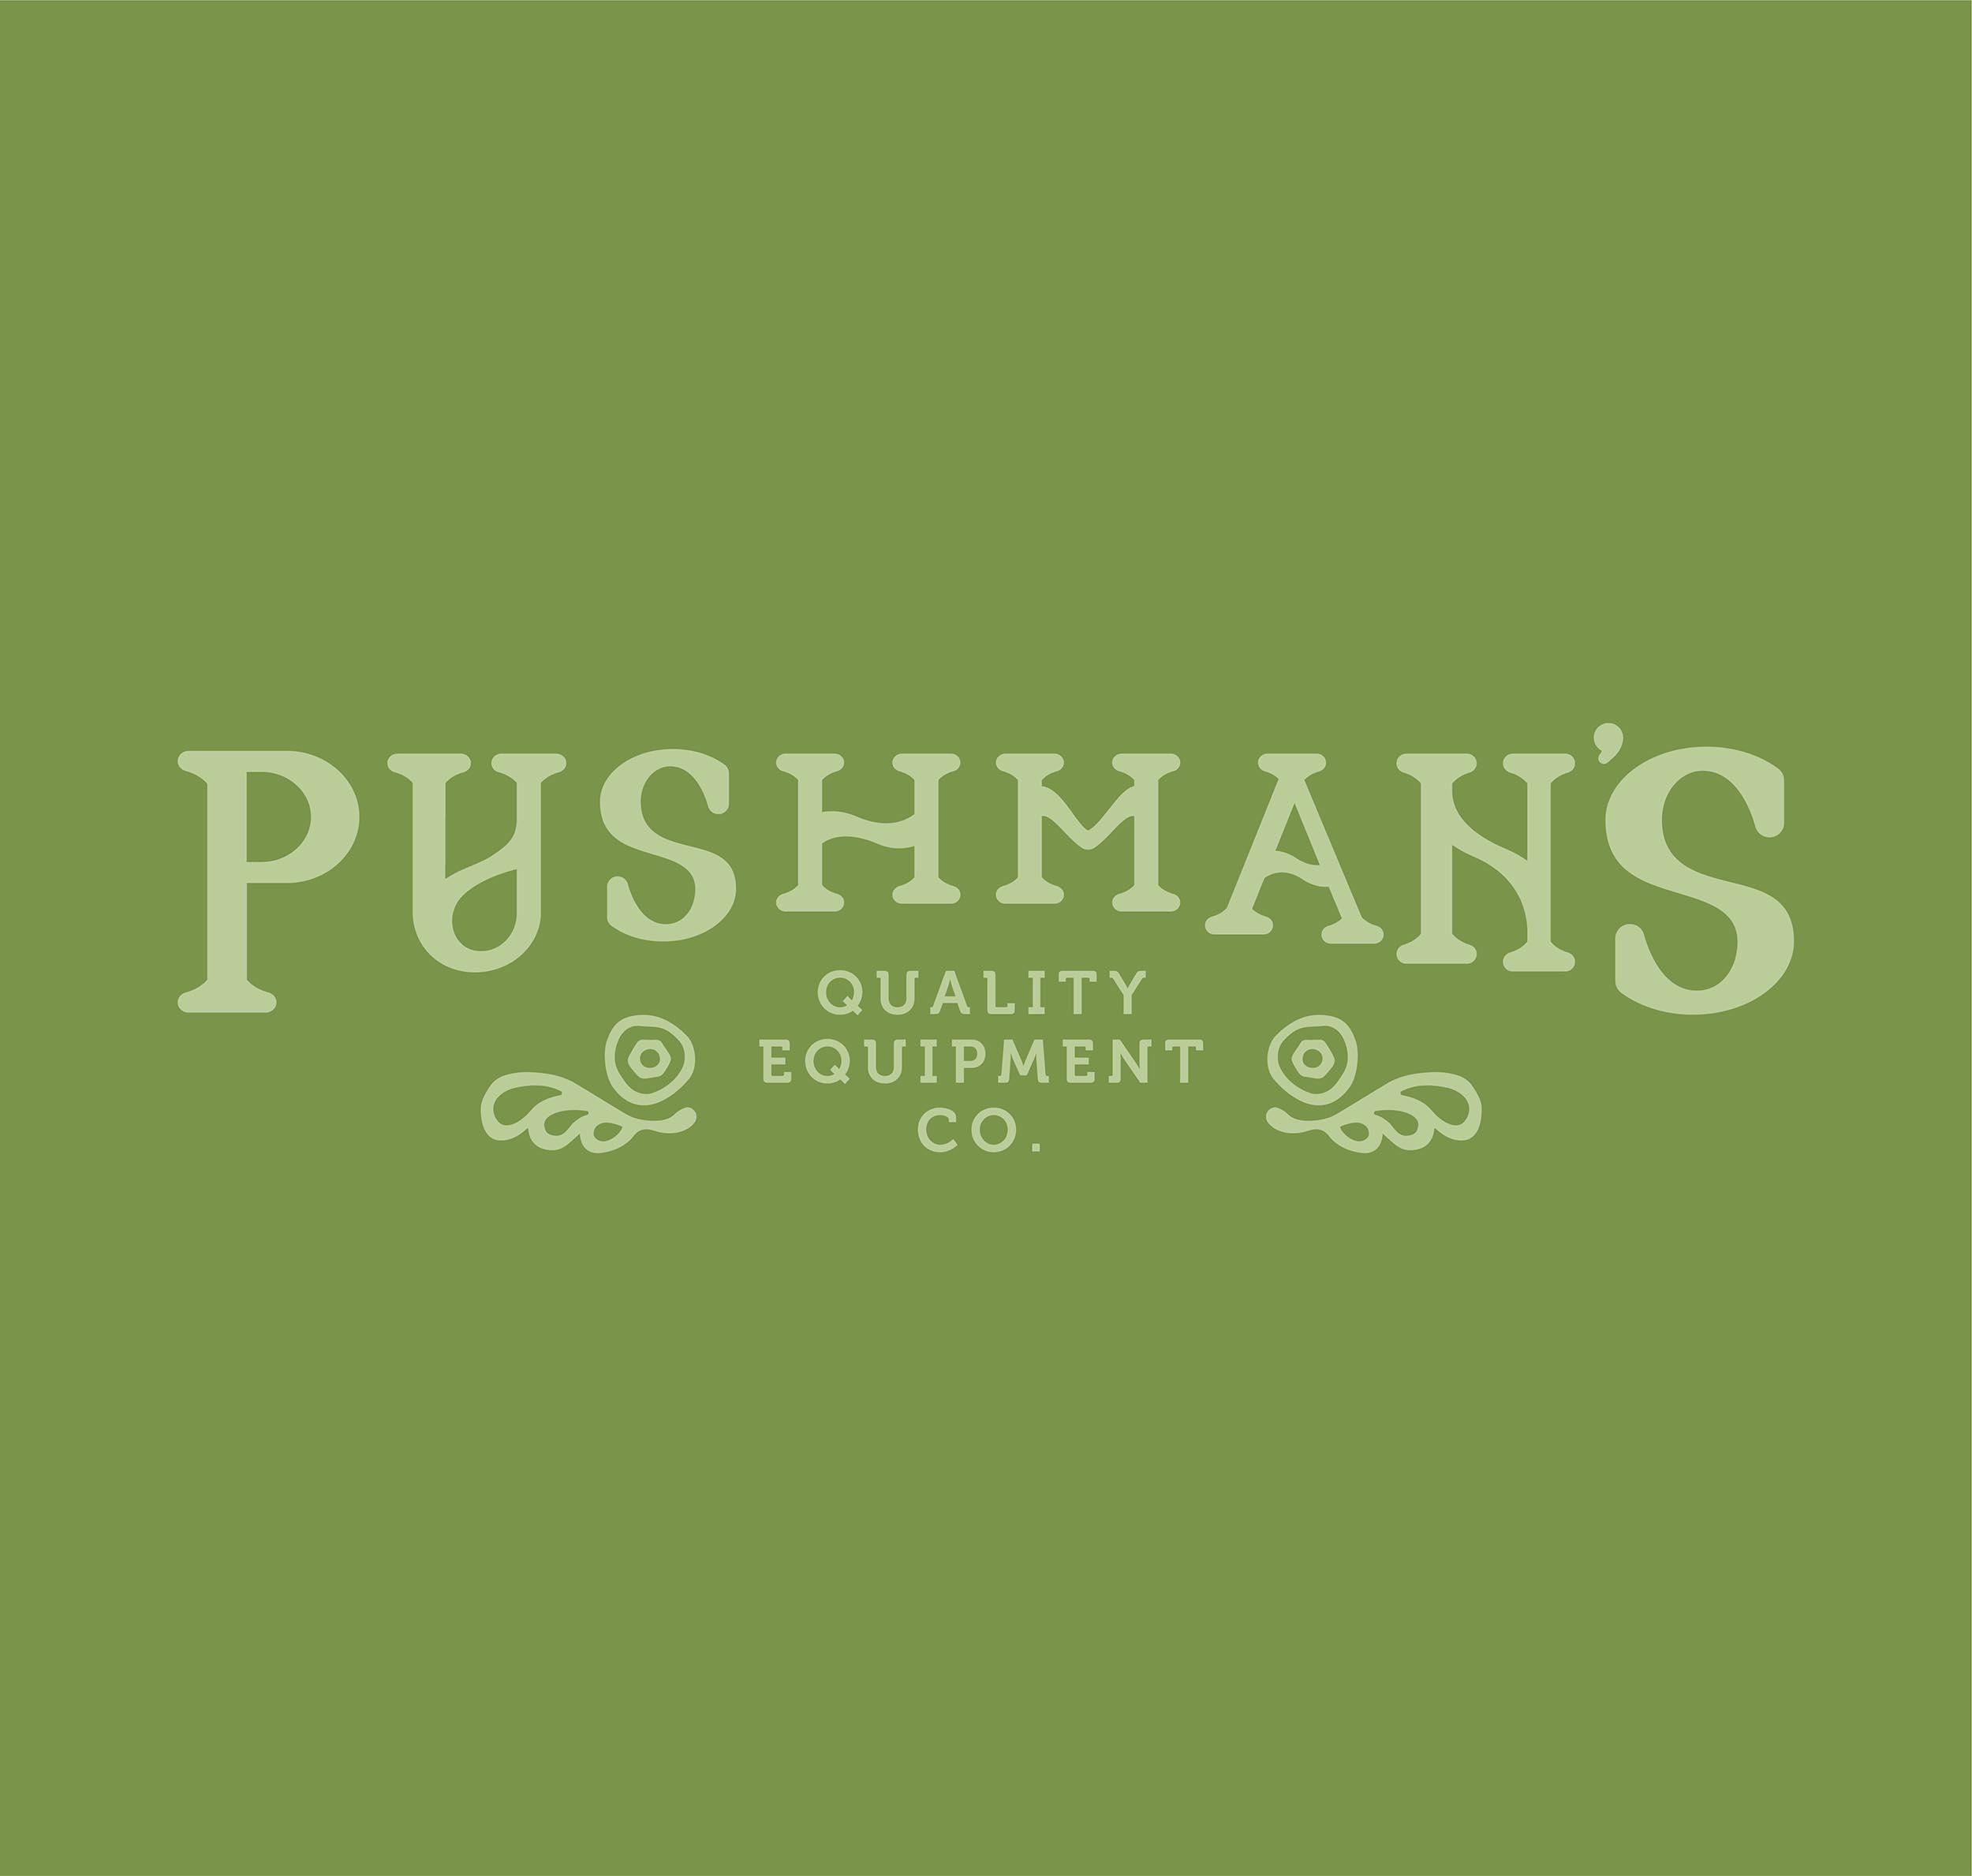 PUSHMANS_QUALITY_EQUIPMENT_CO